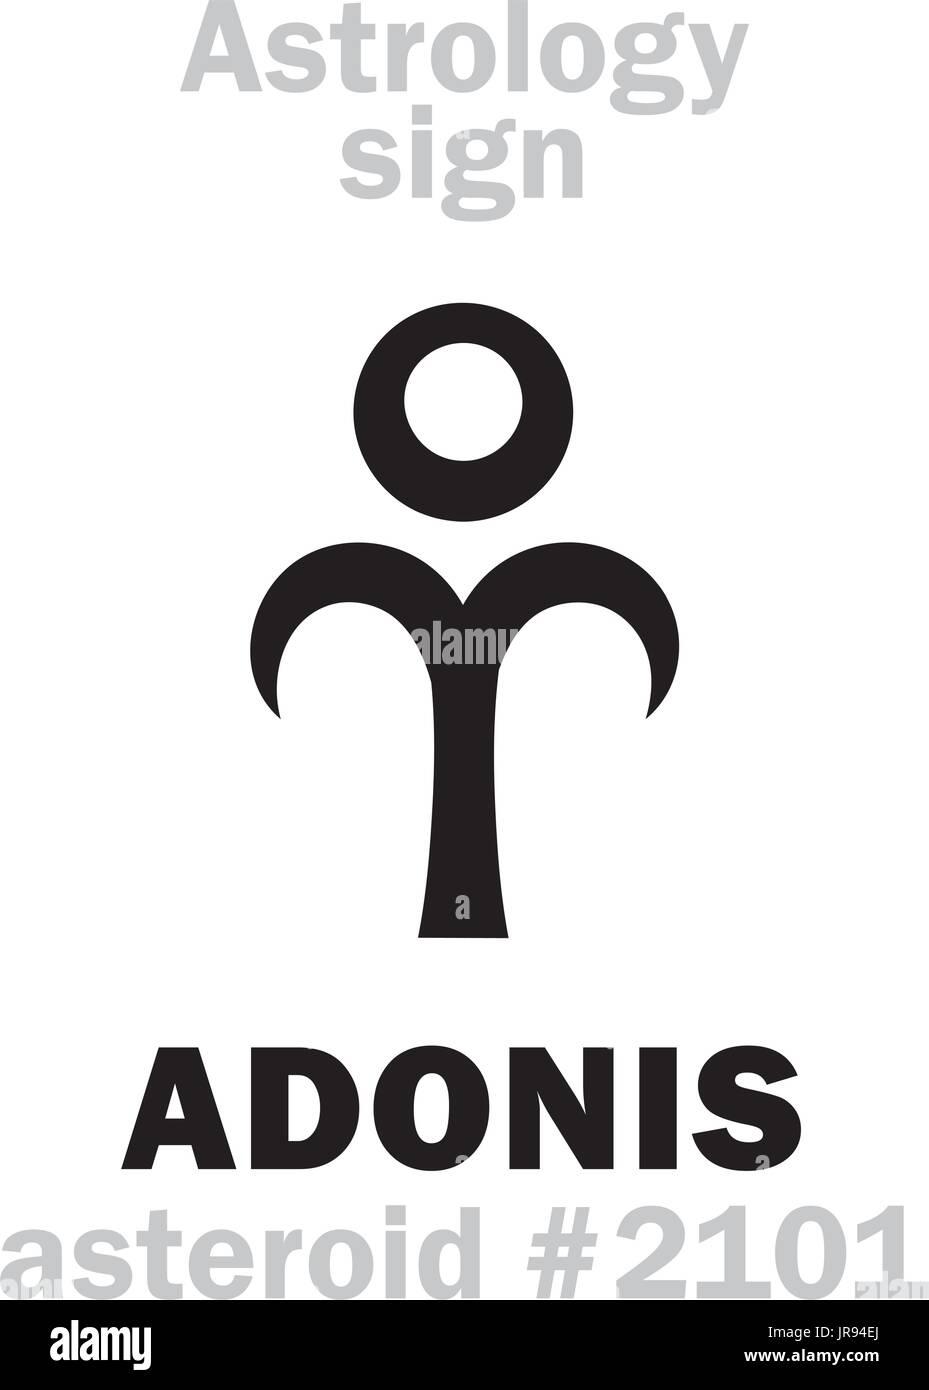 Astrology Alphabet: ADONIS (Attis), asteroid #2101